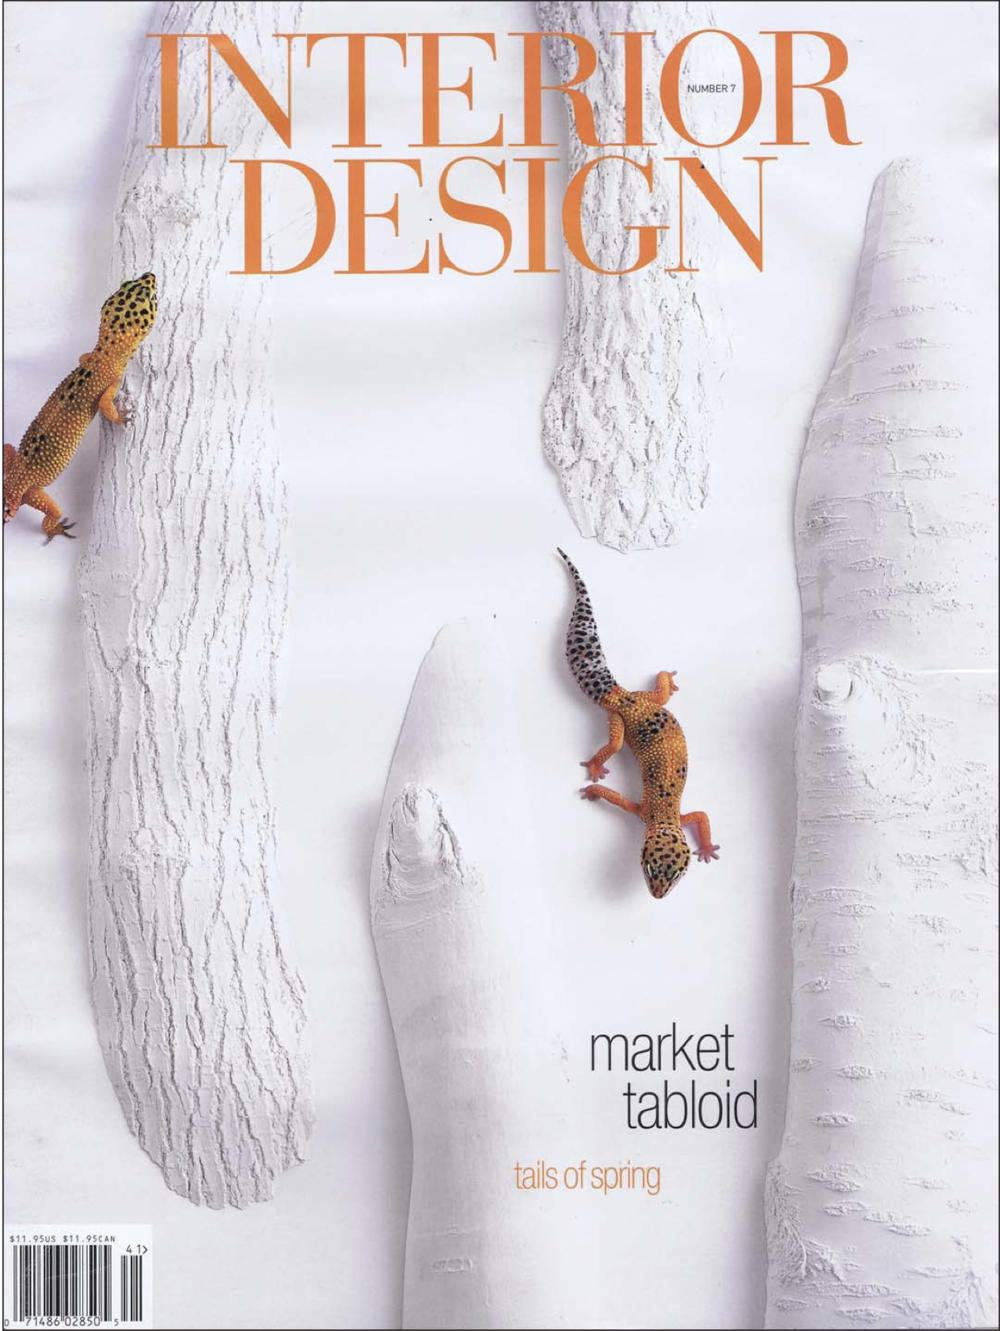 reeta-gyamlani-farrago-design-interior-design-magazine-1